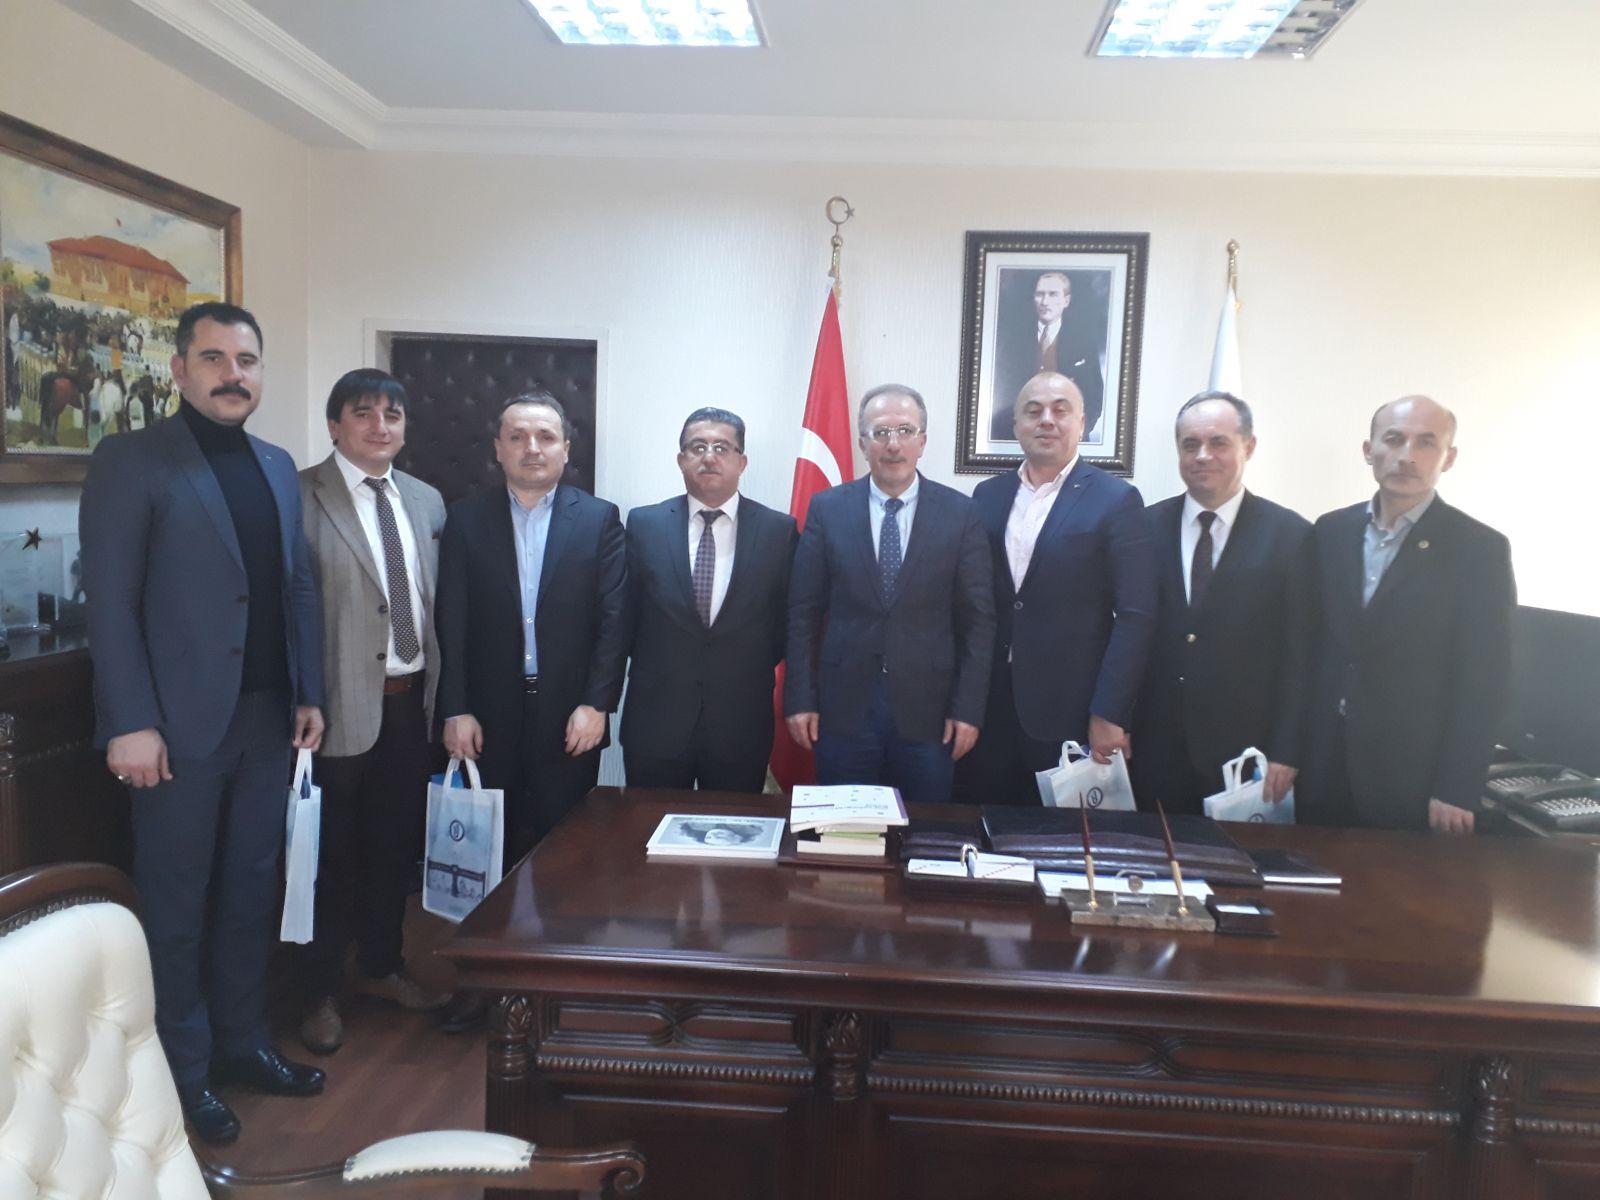 Bartın EBS Yönetimi Rektör Prof. Dr. Orhan UZUN'u ziyaret etti